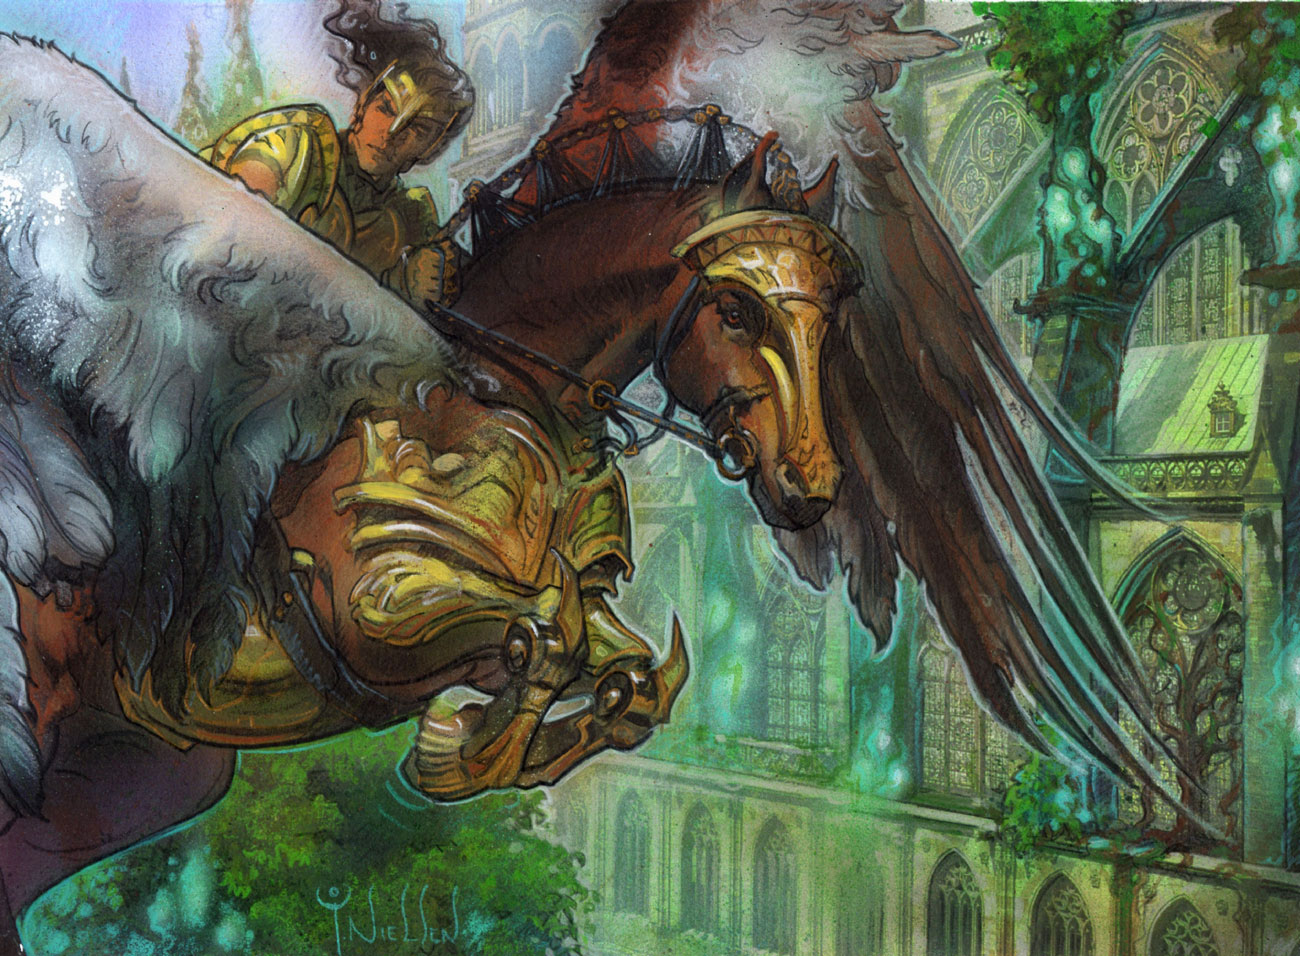 (c) Wizards of the Coast - Illus. Terese Nielsen